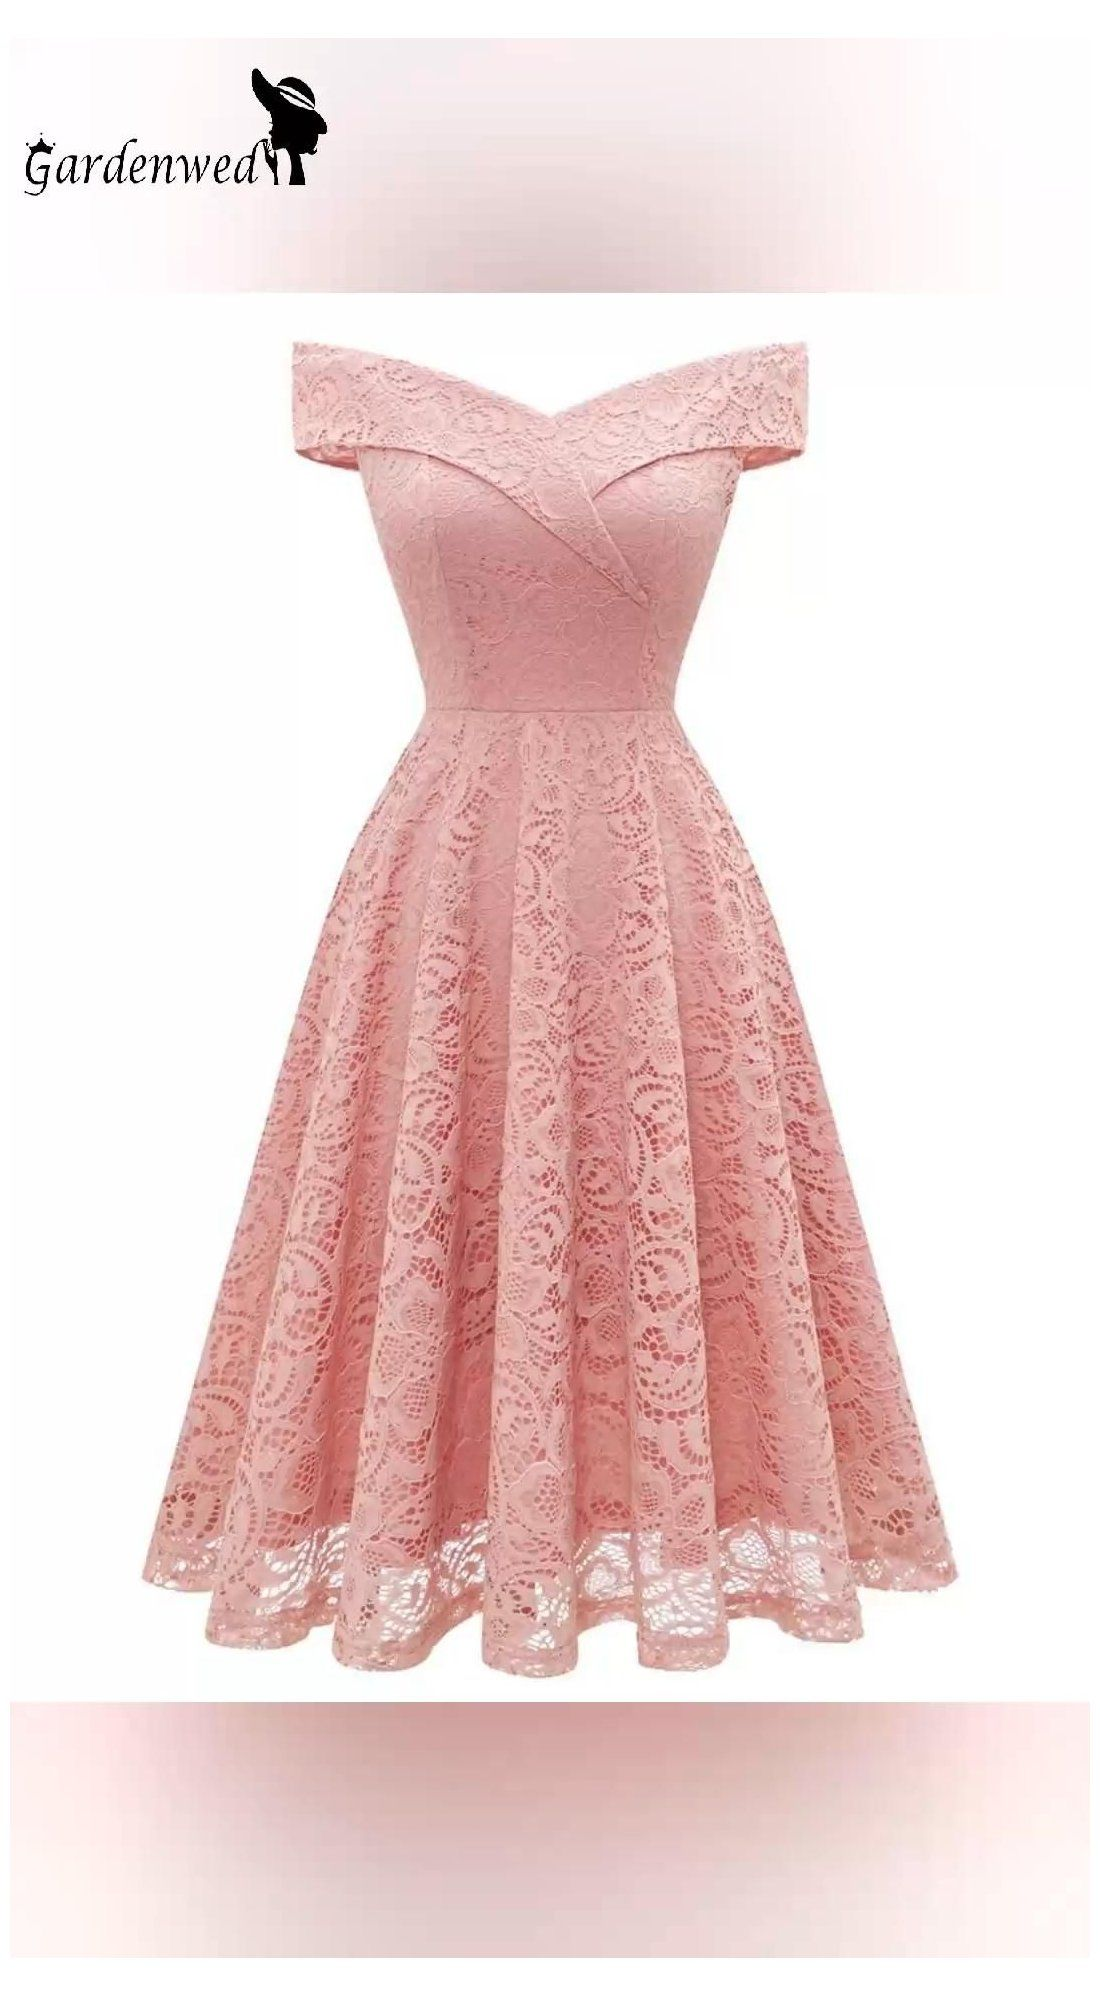 Retro Vintage Floral Lace Cocktail Party Dress Off The Shoulder Bridesmaid Swing Dresses Semi Formal Dresses For Wedd Dresses By Length Lace Dress Dresses [ 1996 x 1100 Pixel ]